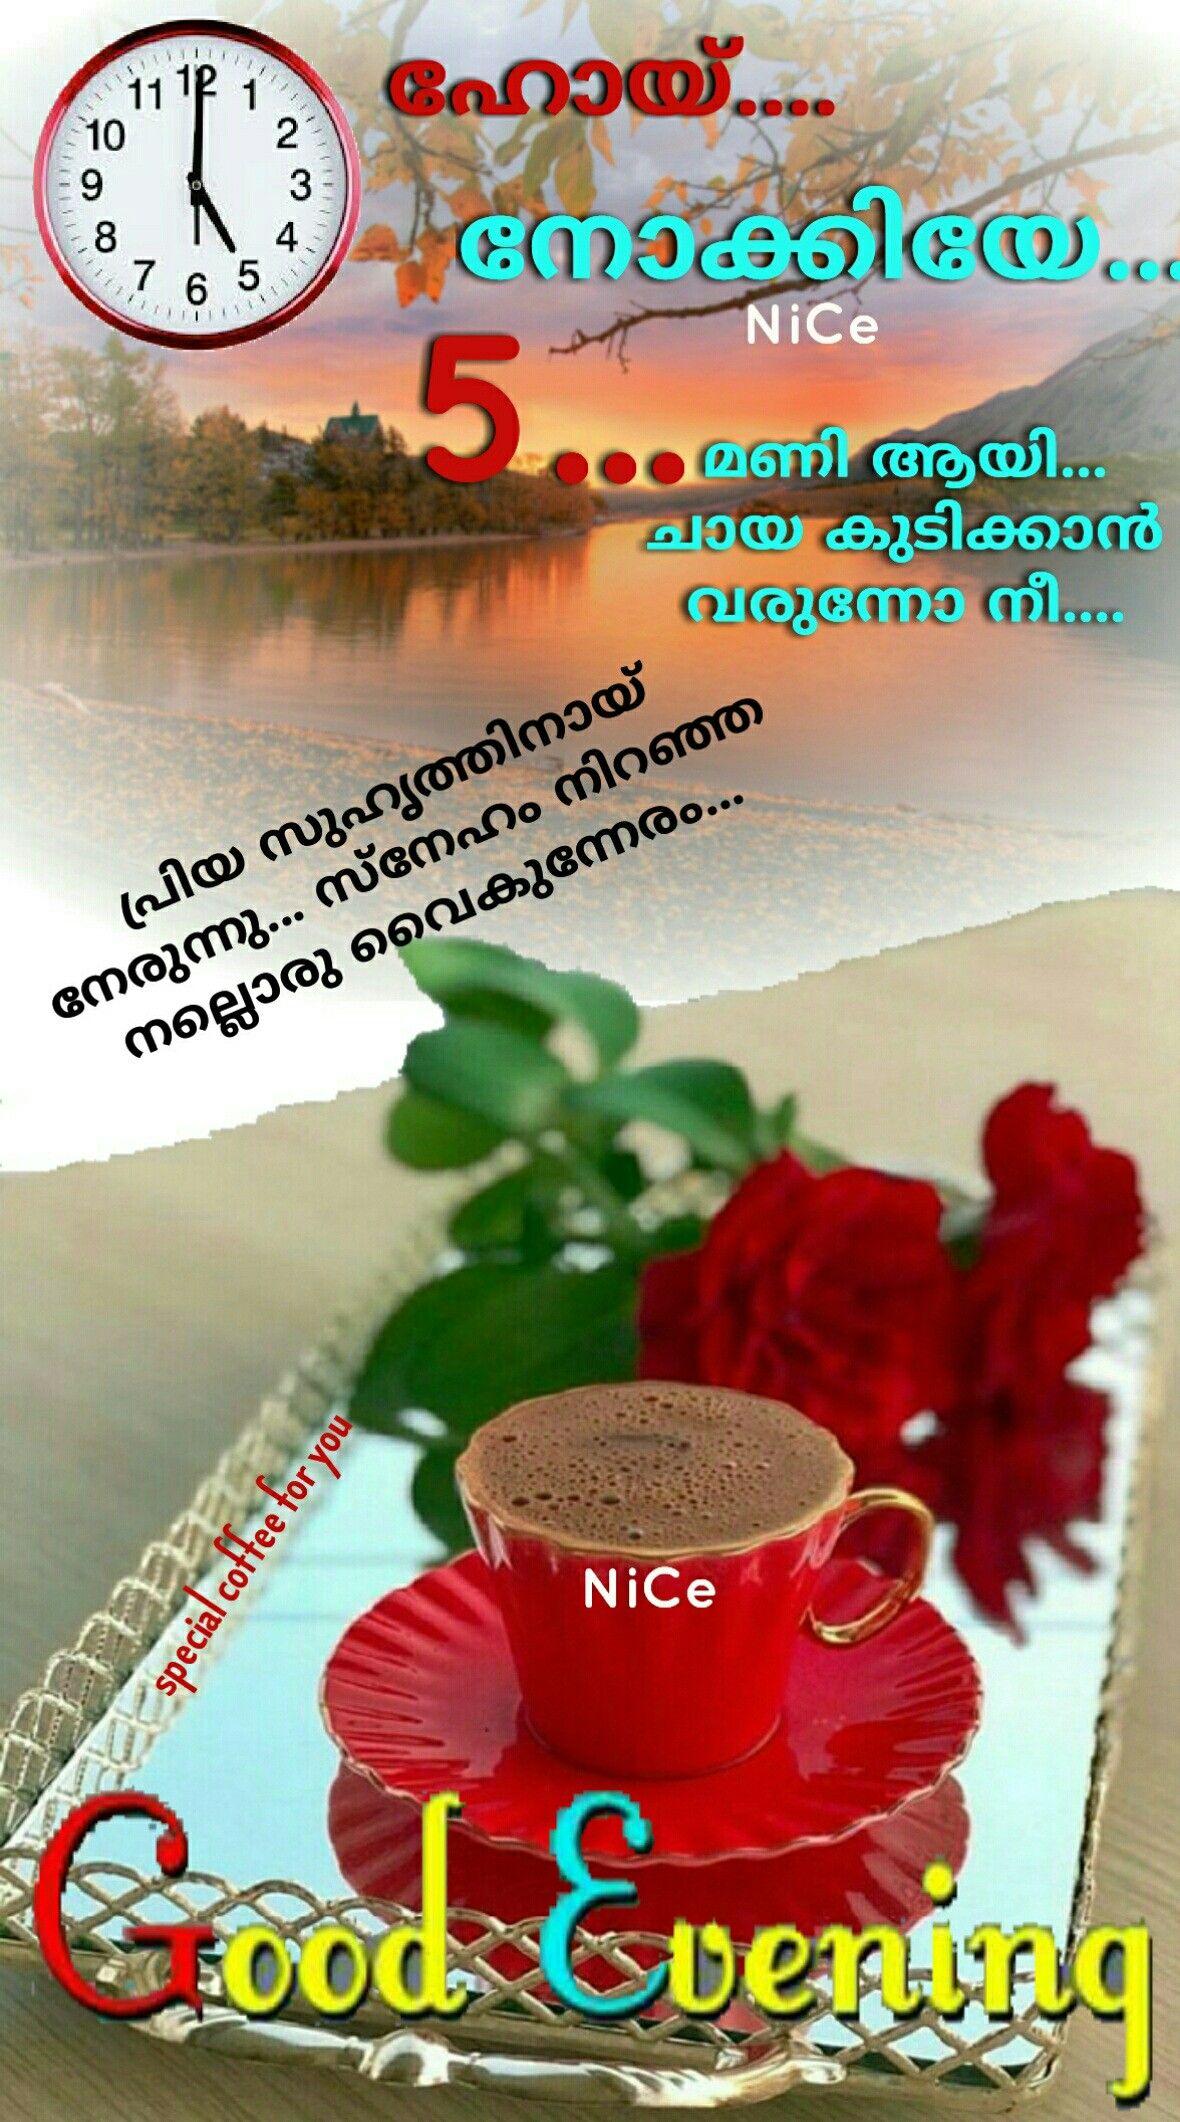 Pin by Aket Ket on Good Evening Good evening, Best, Evening